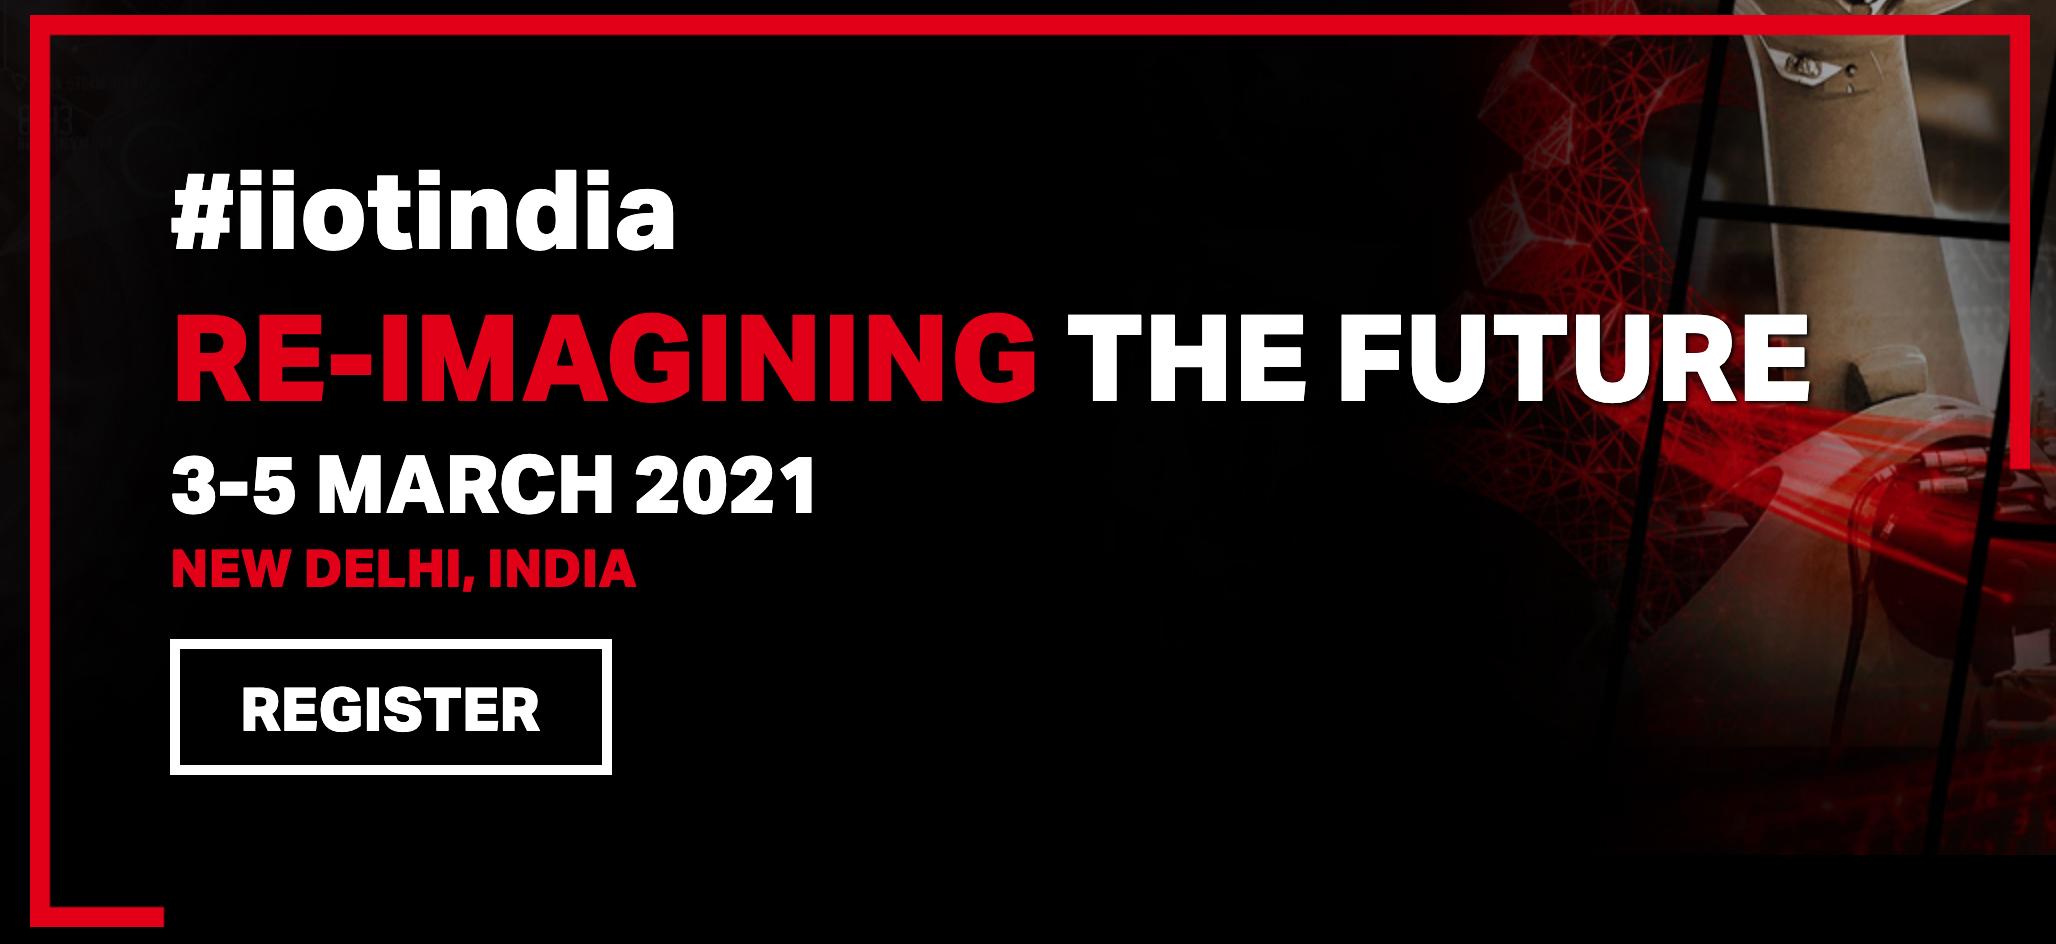 IIoT India 2021